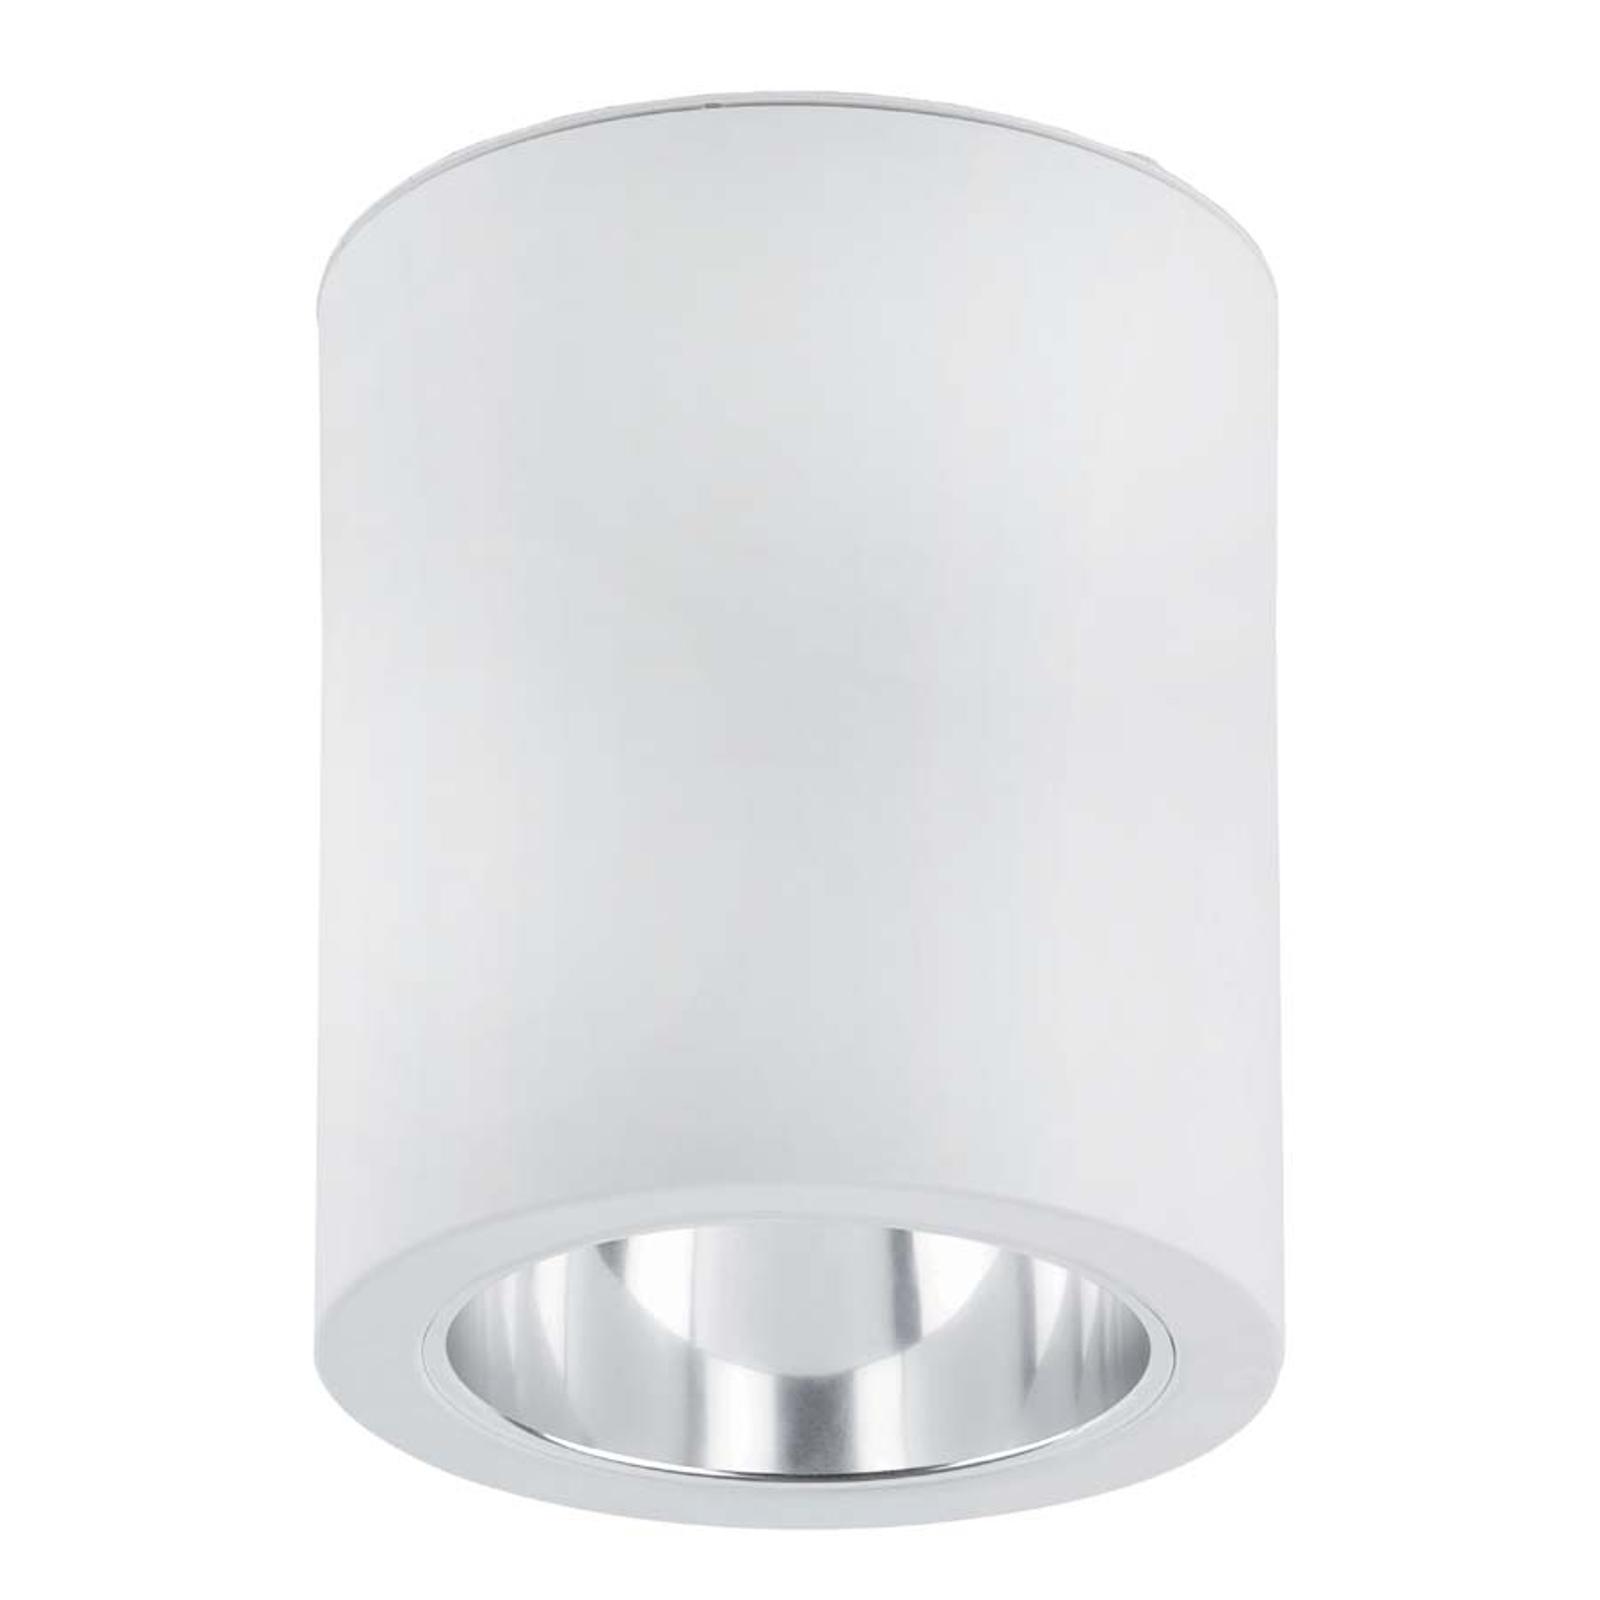 Æstetisk, hvide Pote-1 loftlampe i aluminium